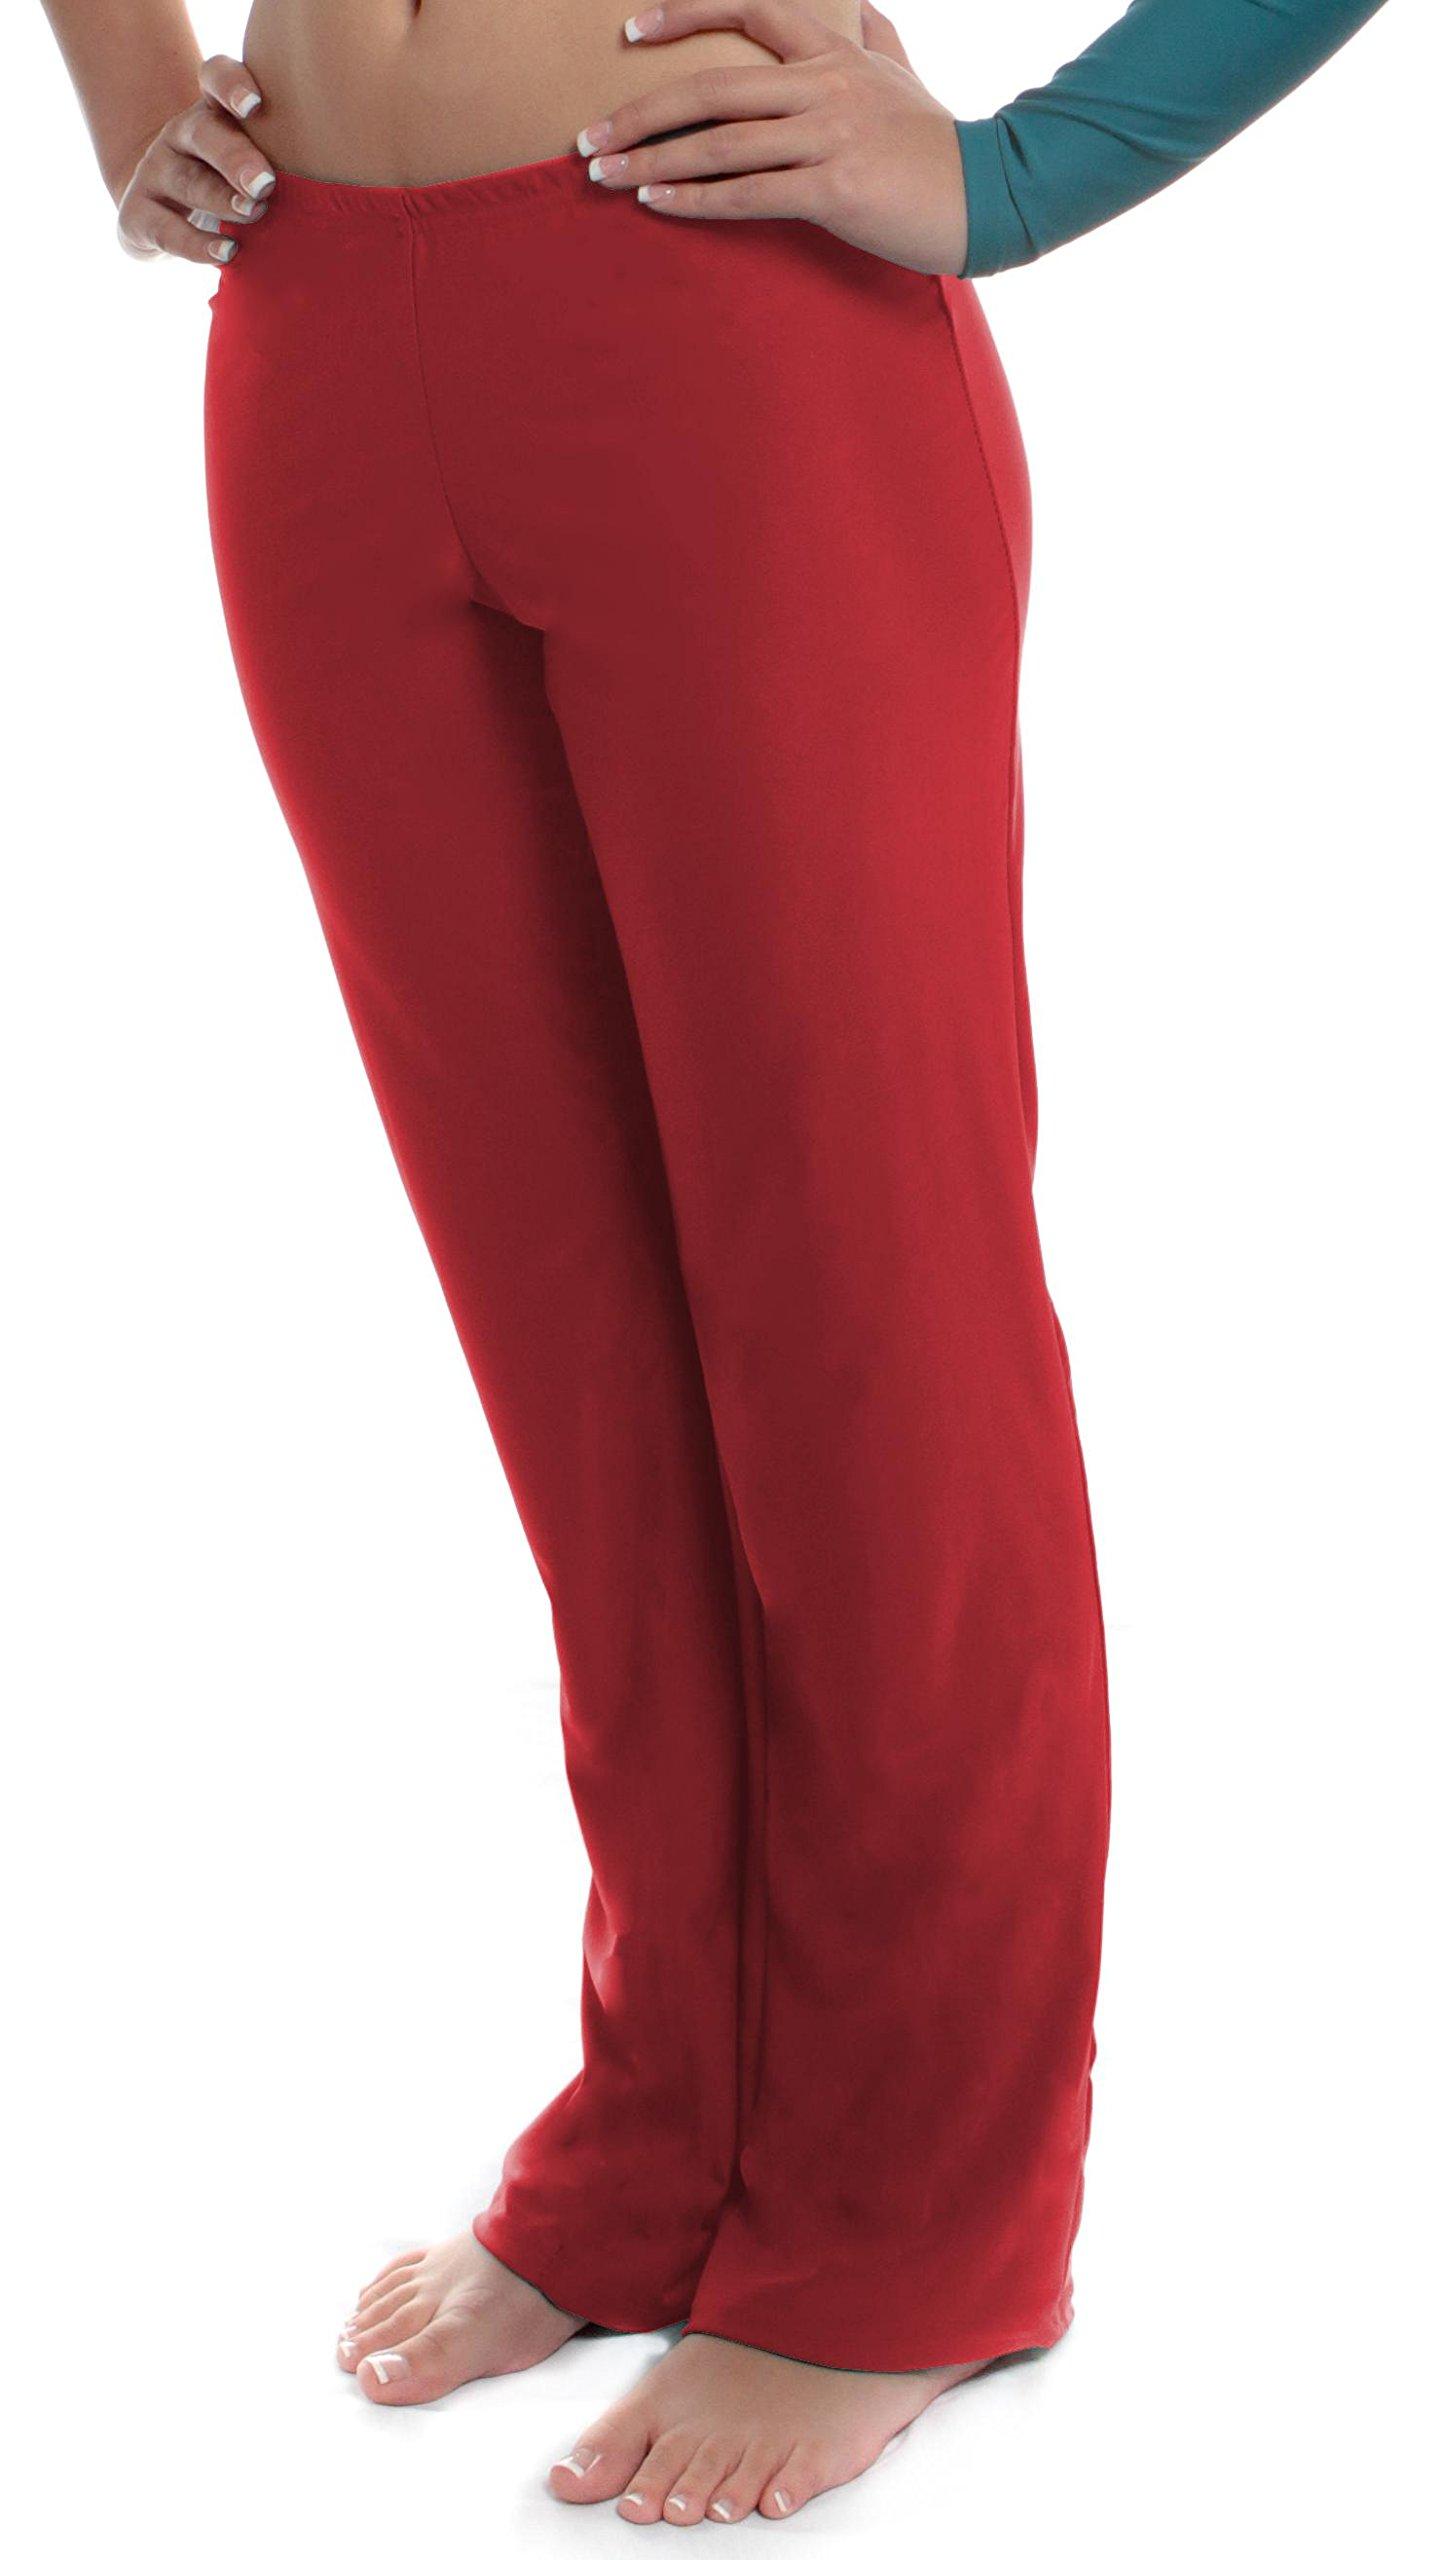 B Dancewear Girls Jazz Pants Medium Red Child and Kid Sizes by B Dancewear